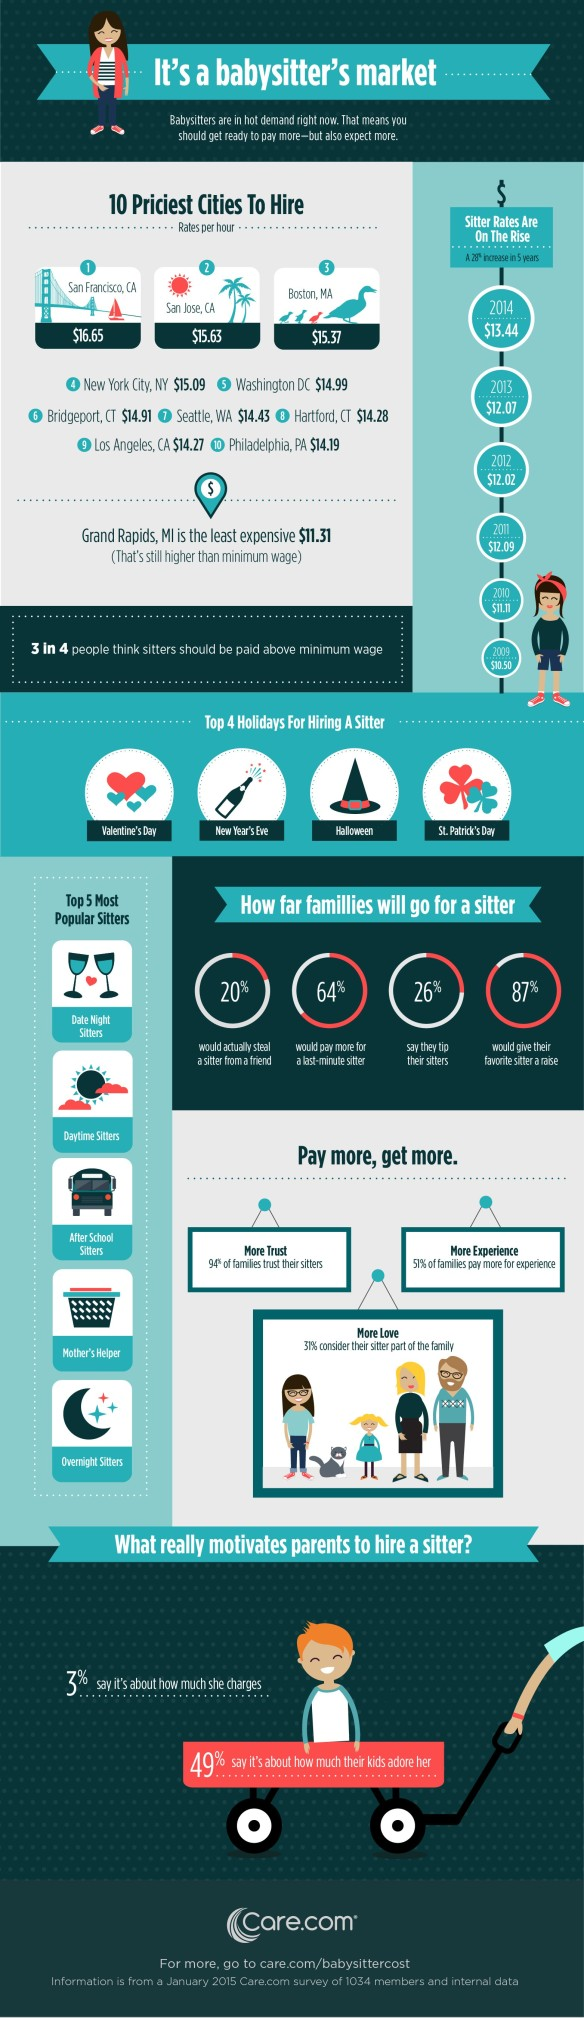 caredotcom-babysitter-infographic-2015.jpg